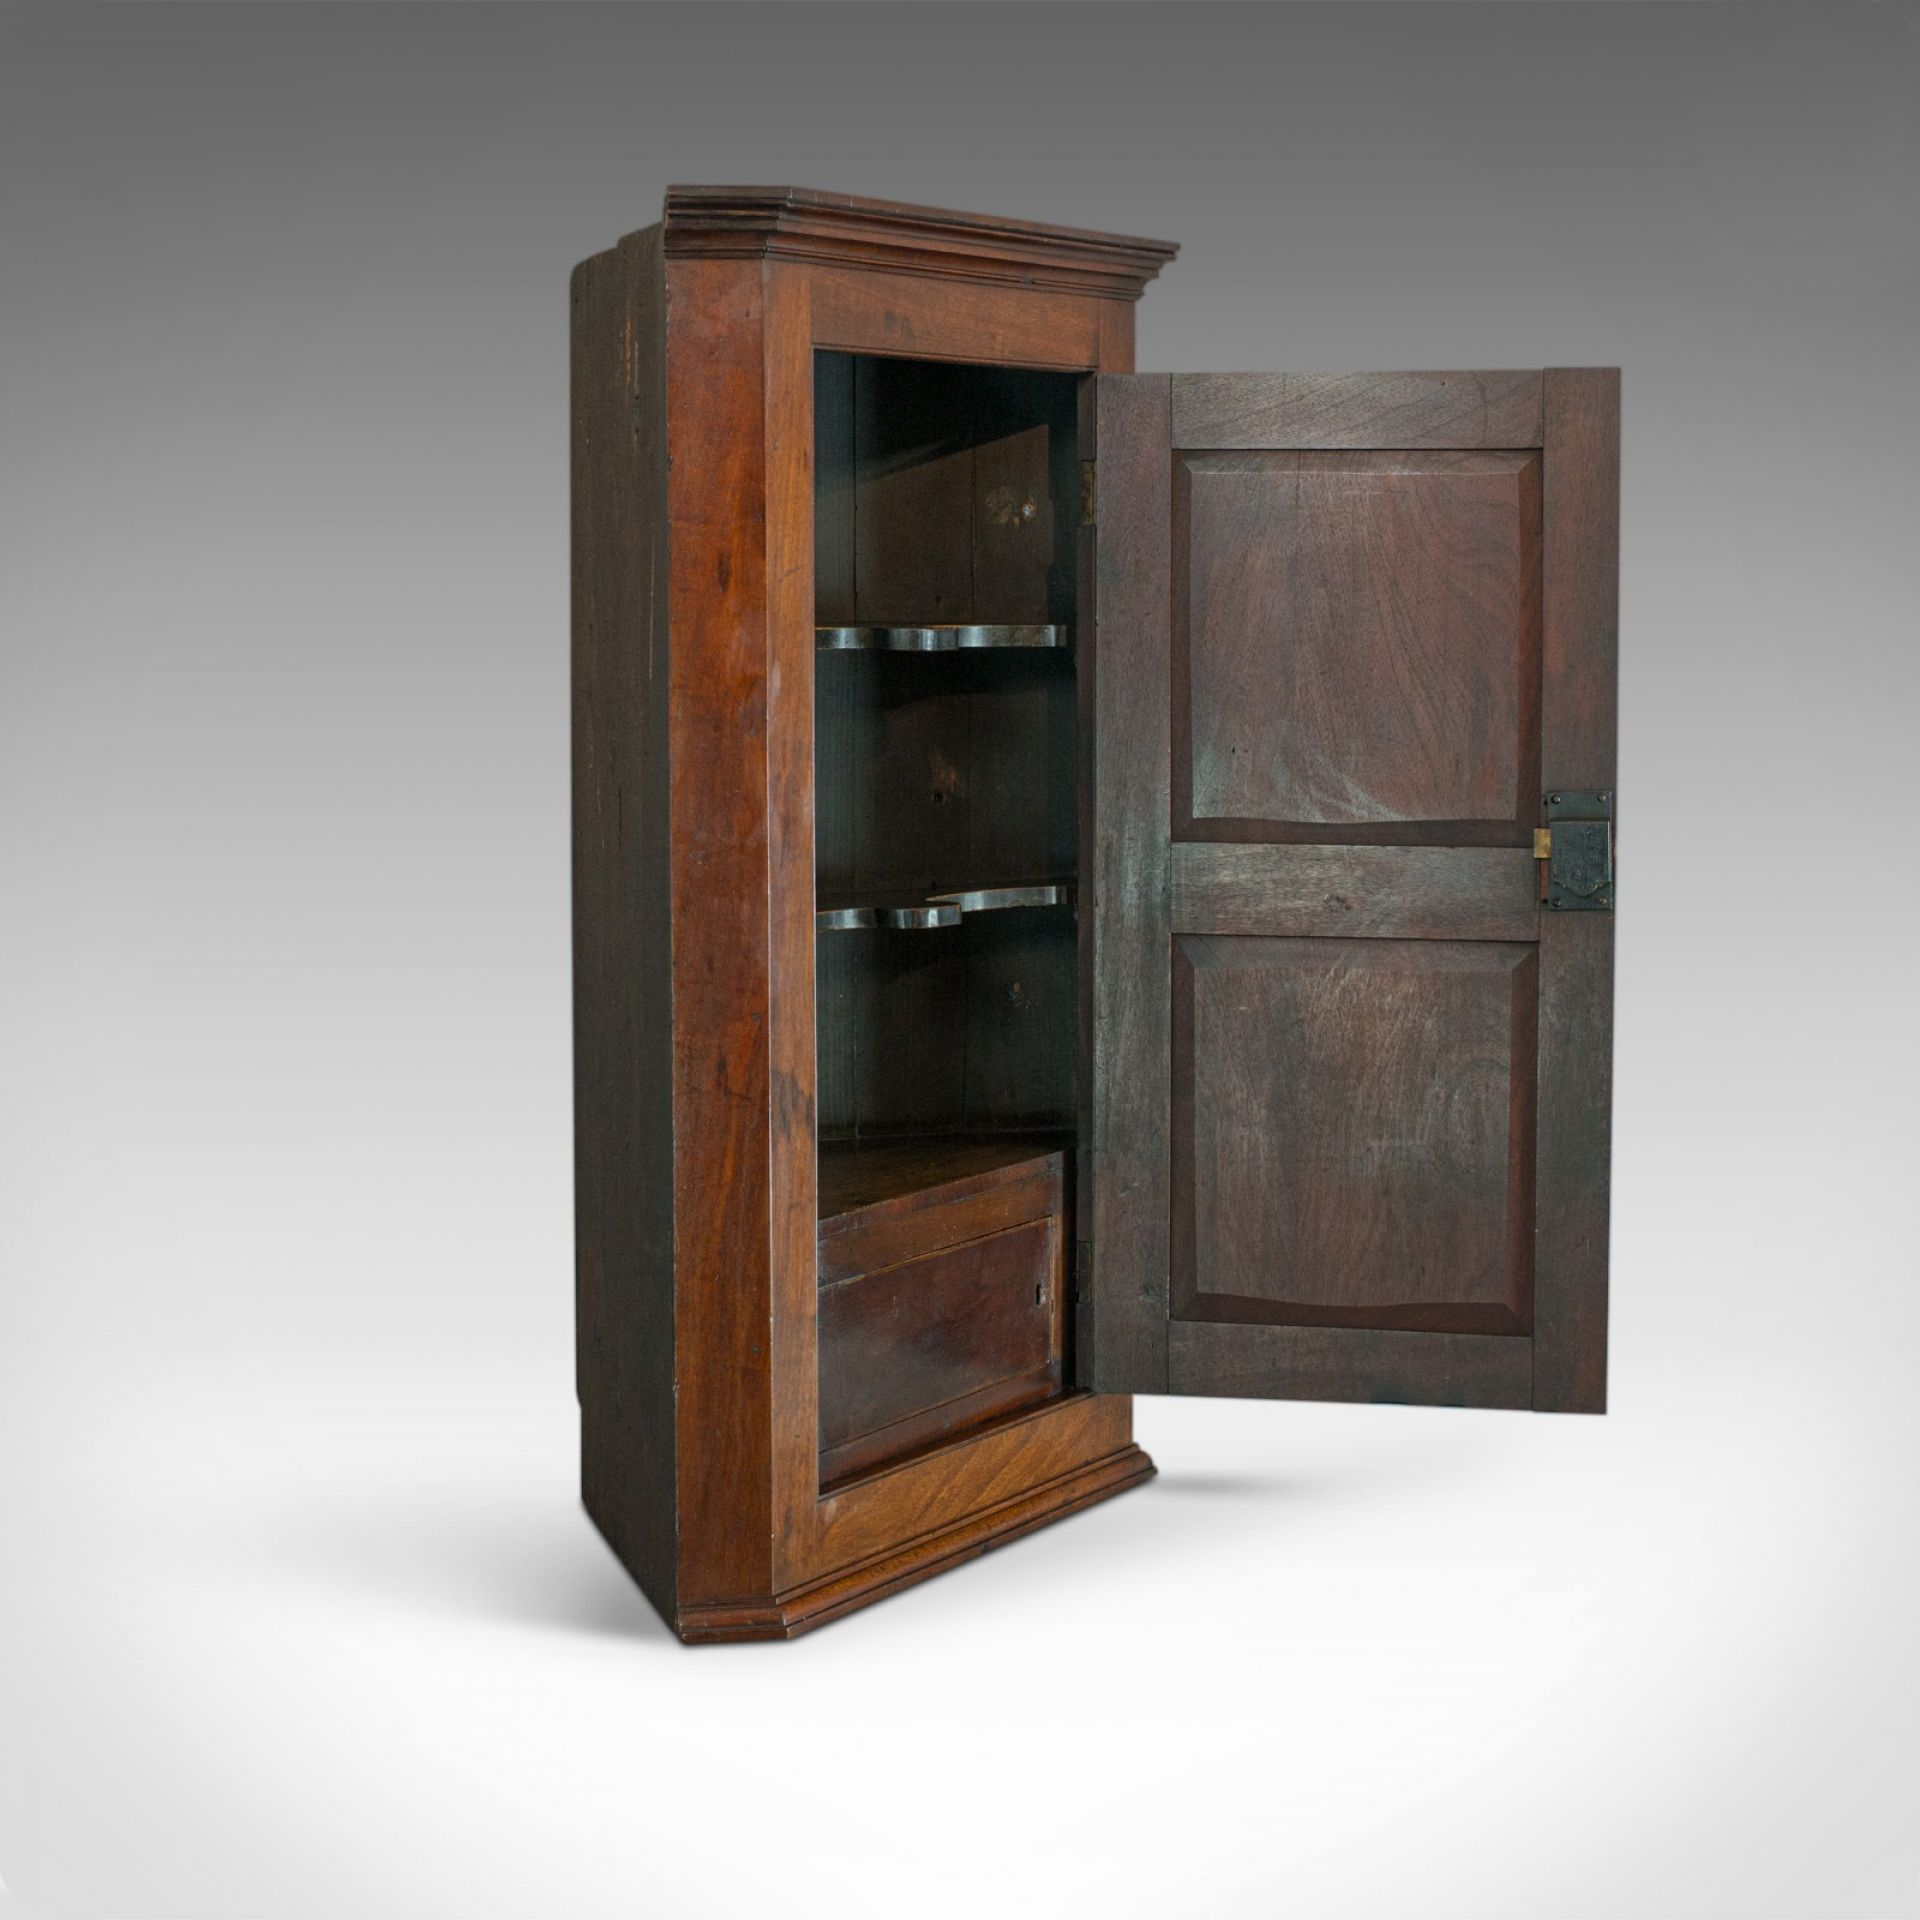 Antique Corner Cabinet, English, Georgian, Mahogany, Cupboard, Circa 1800